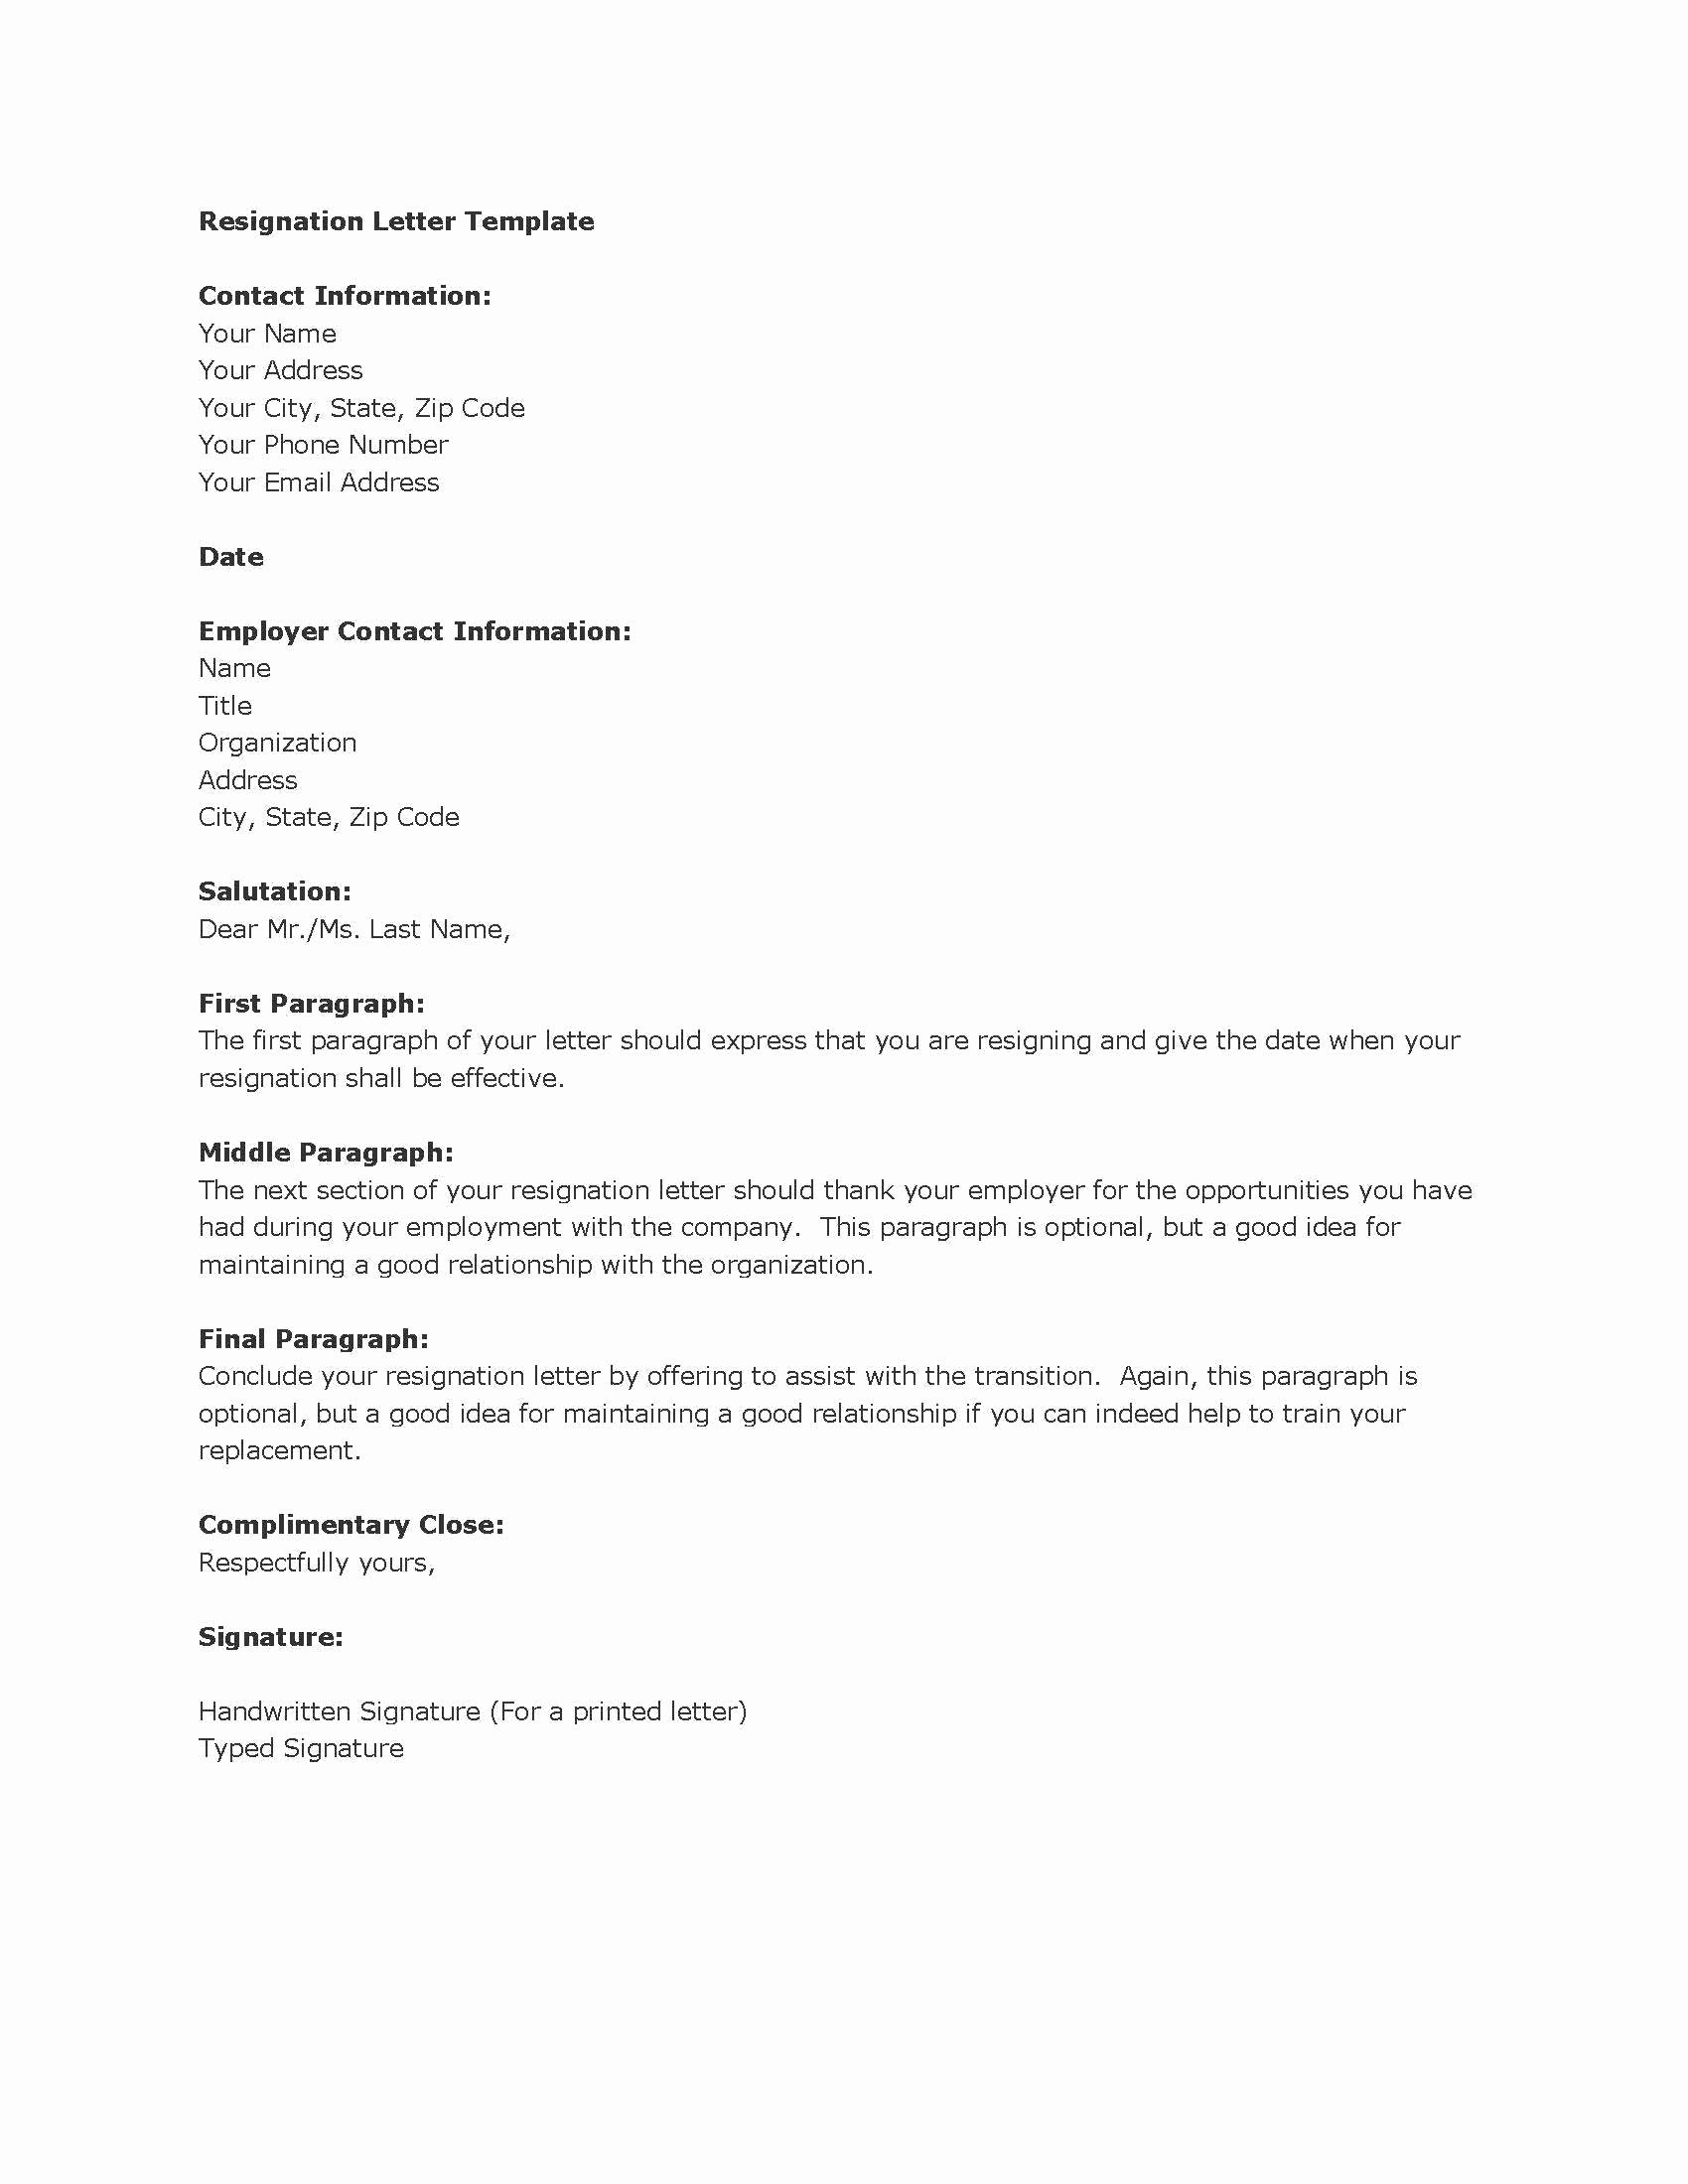 Template for Letter Of Resignation Best Of Resignation Letter Samples Download Pdf Doc format